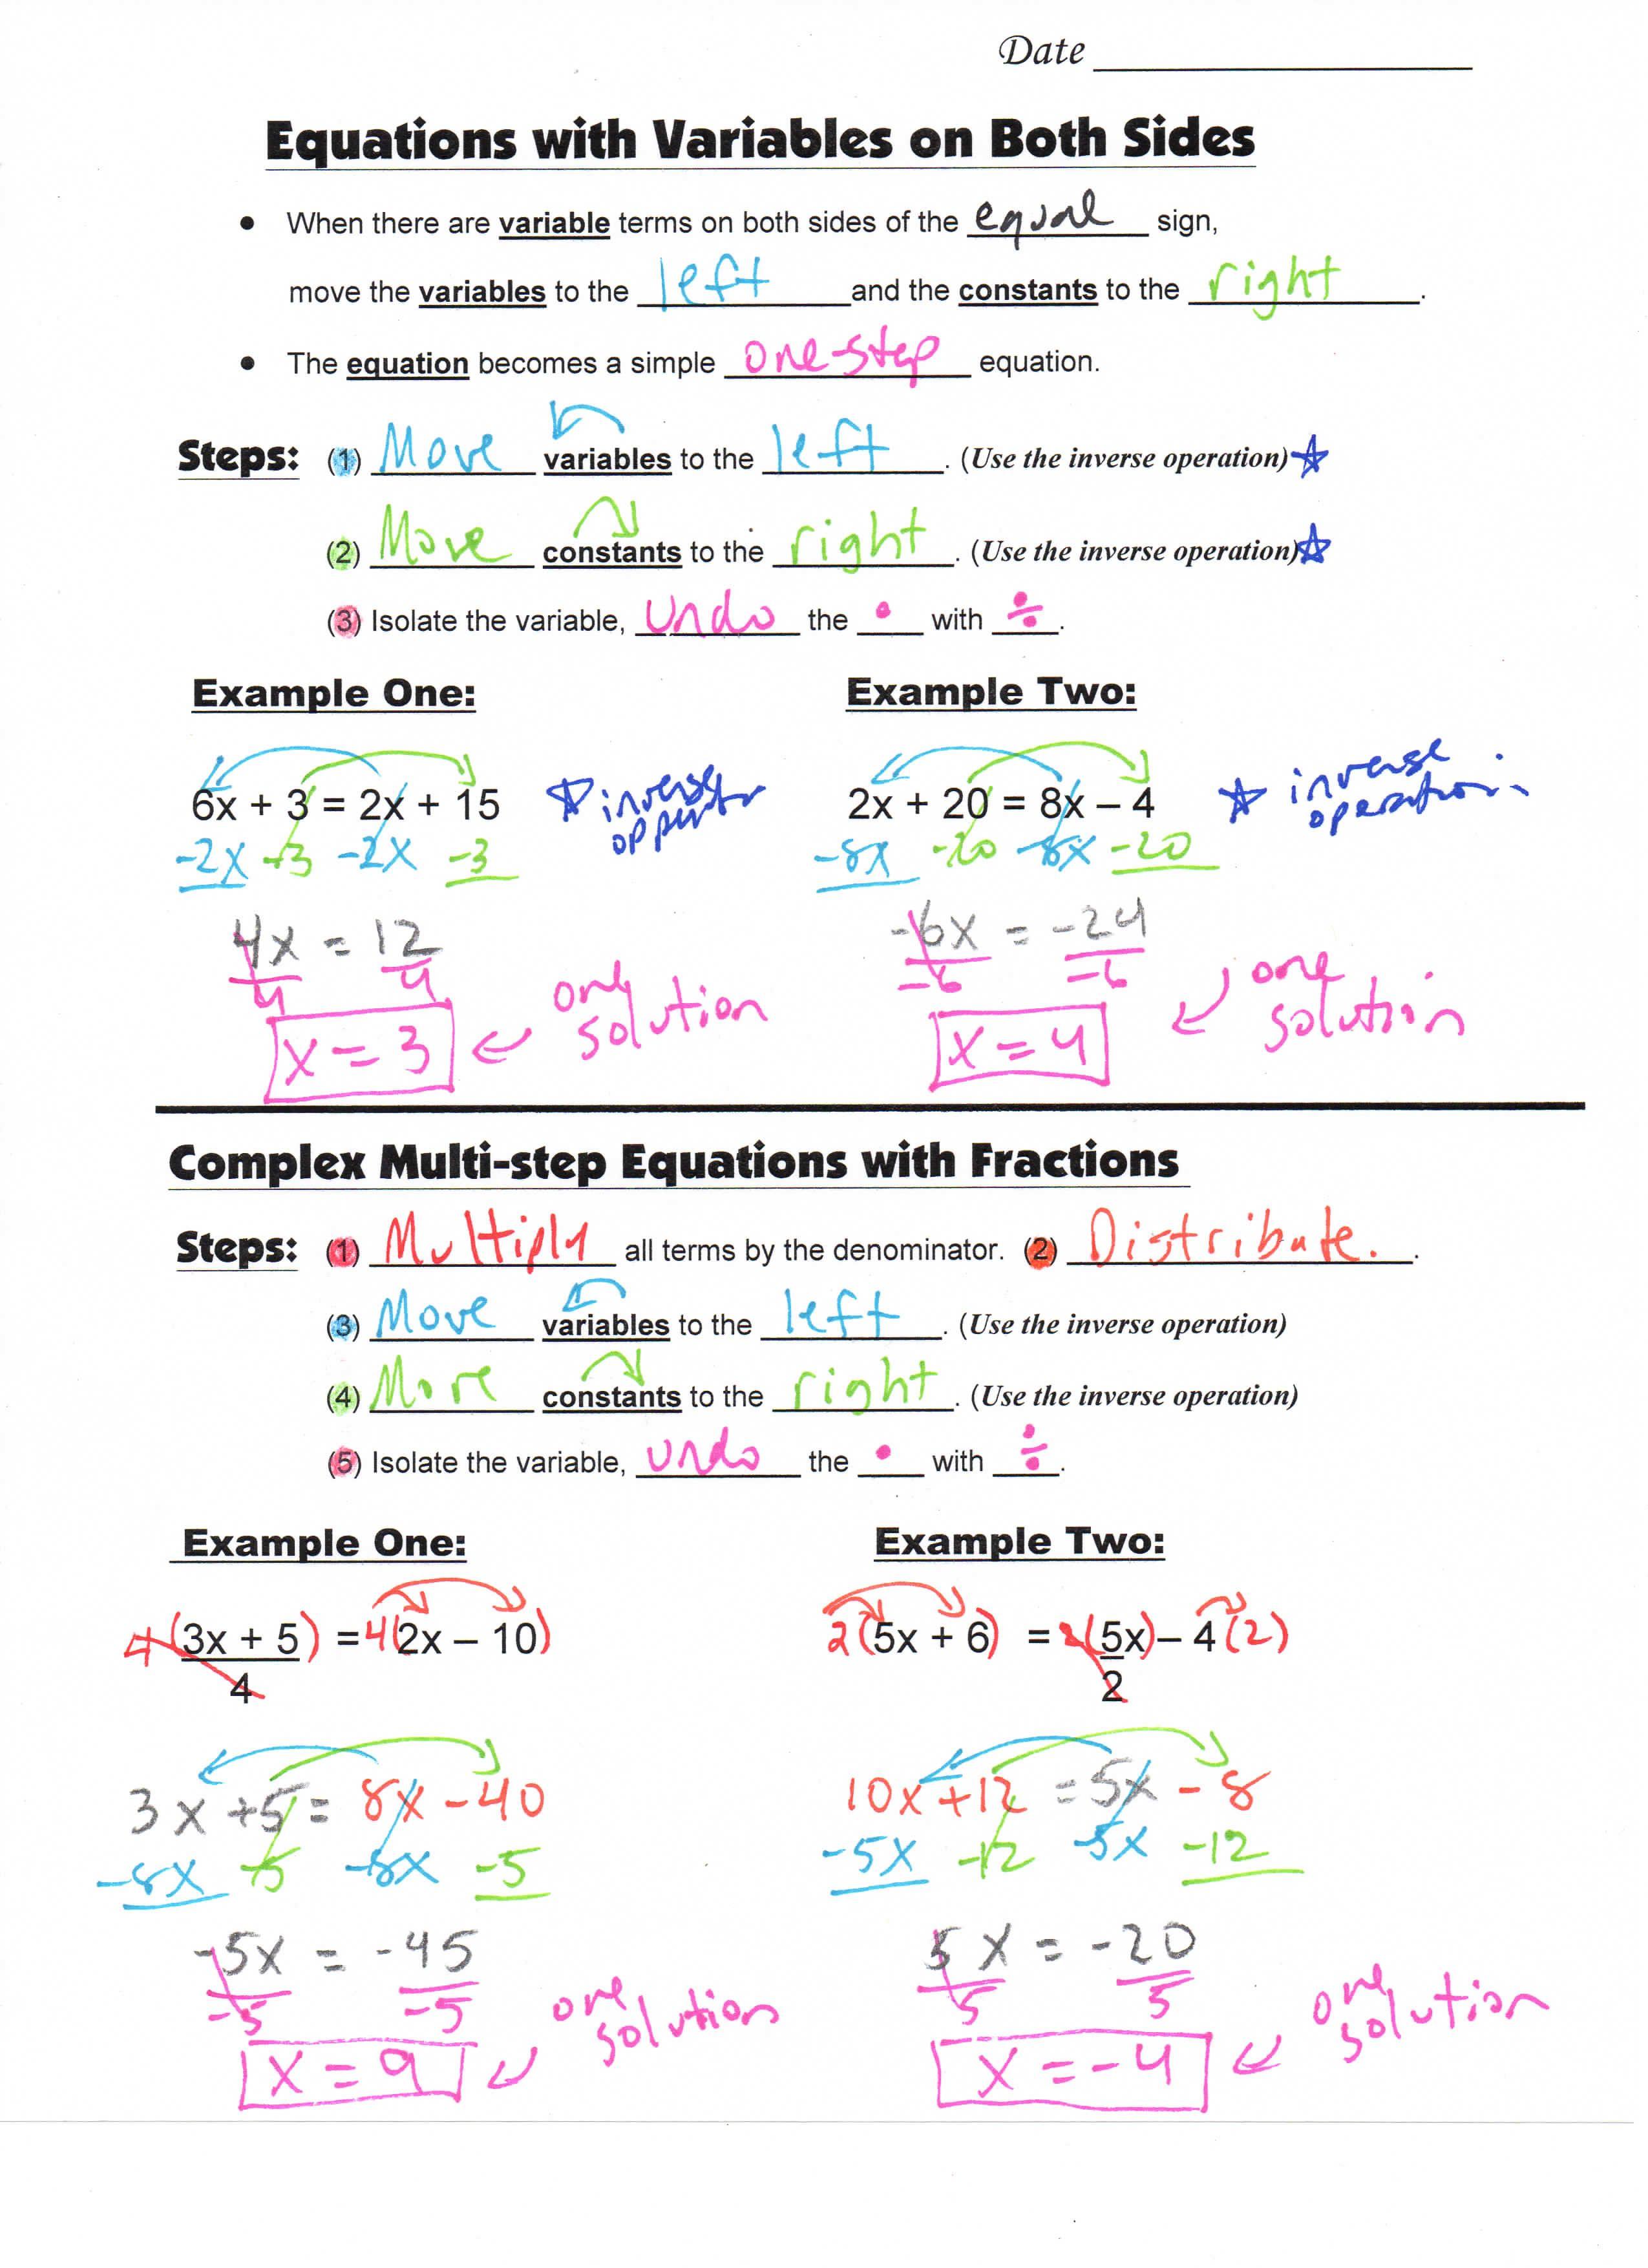 S Teacherspayteachers Product Math 8 Guided